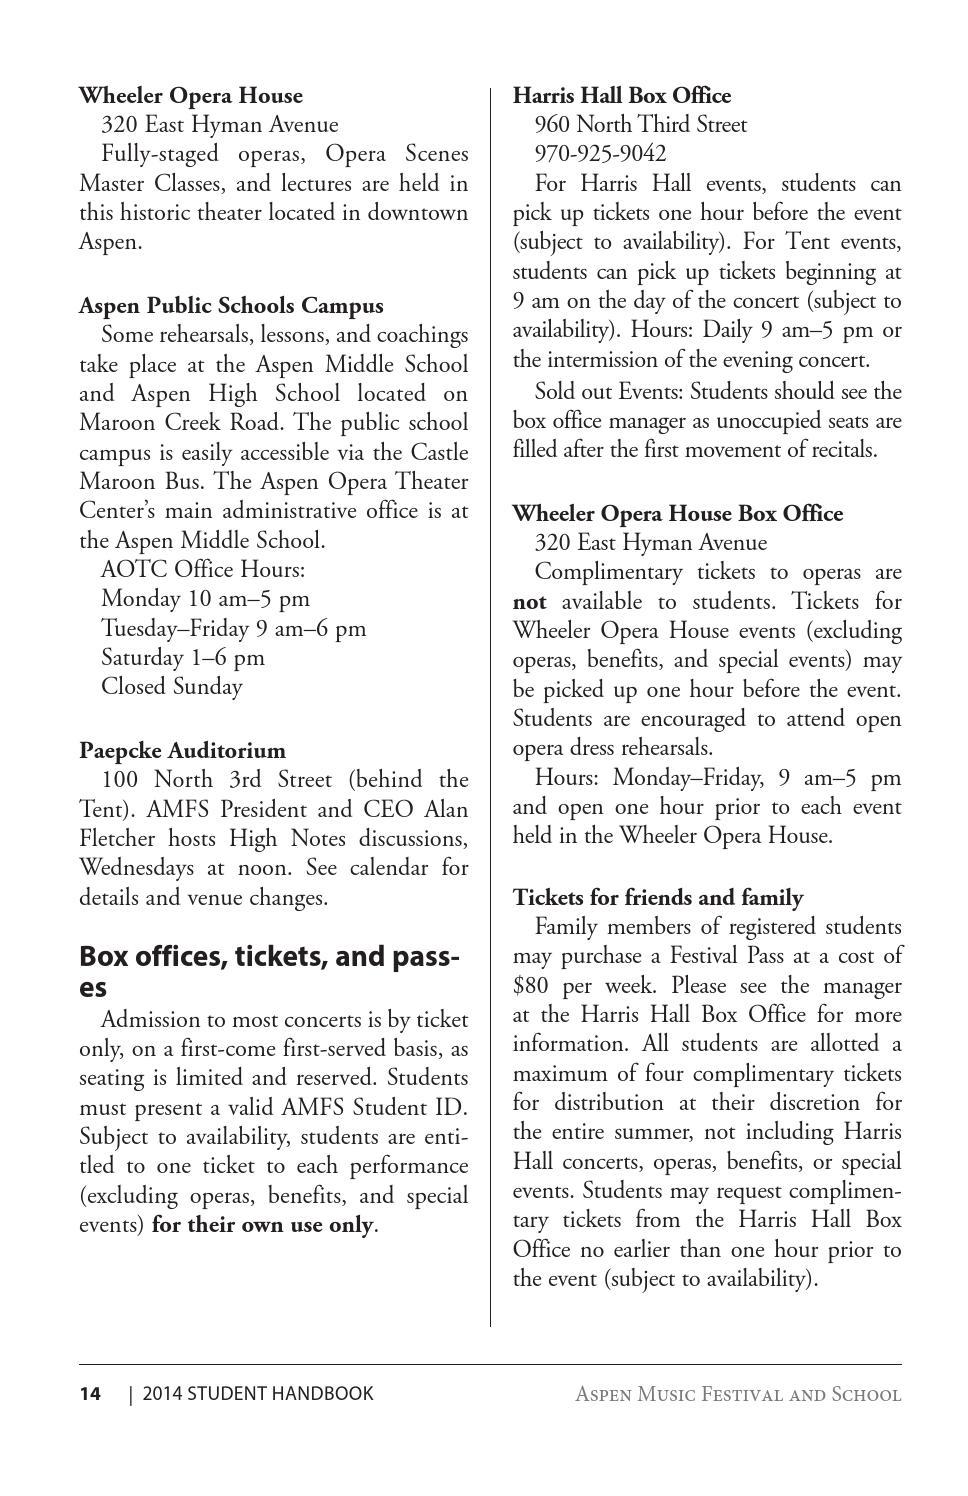 2014 Student Handbook by Aspen Music Festival and School - issuu